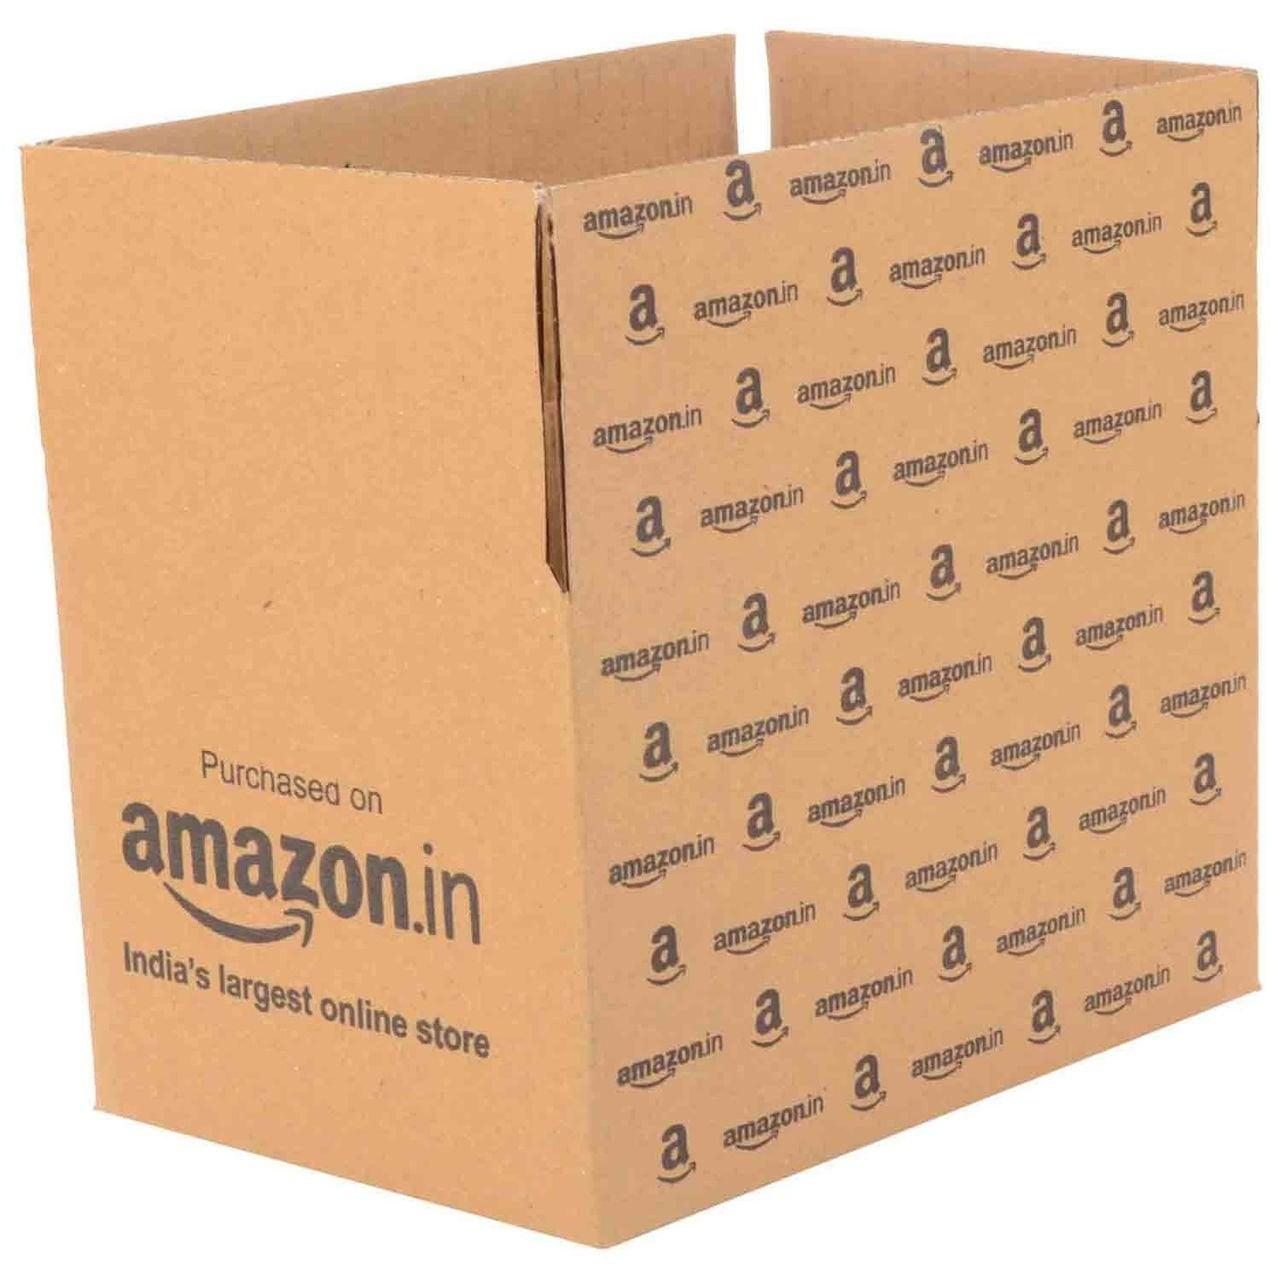 Amazon Corrugated Boxes (5x4.5x3.5-inch)